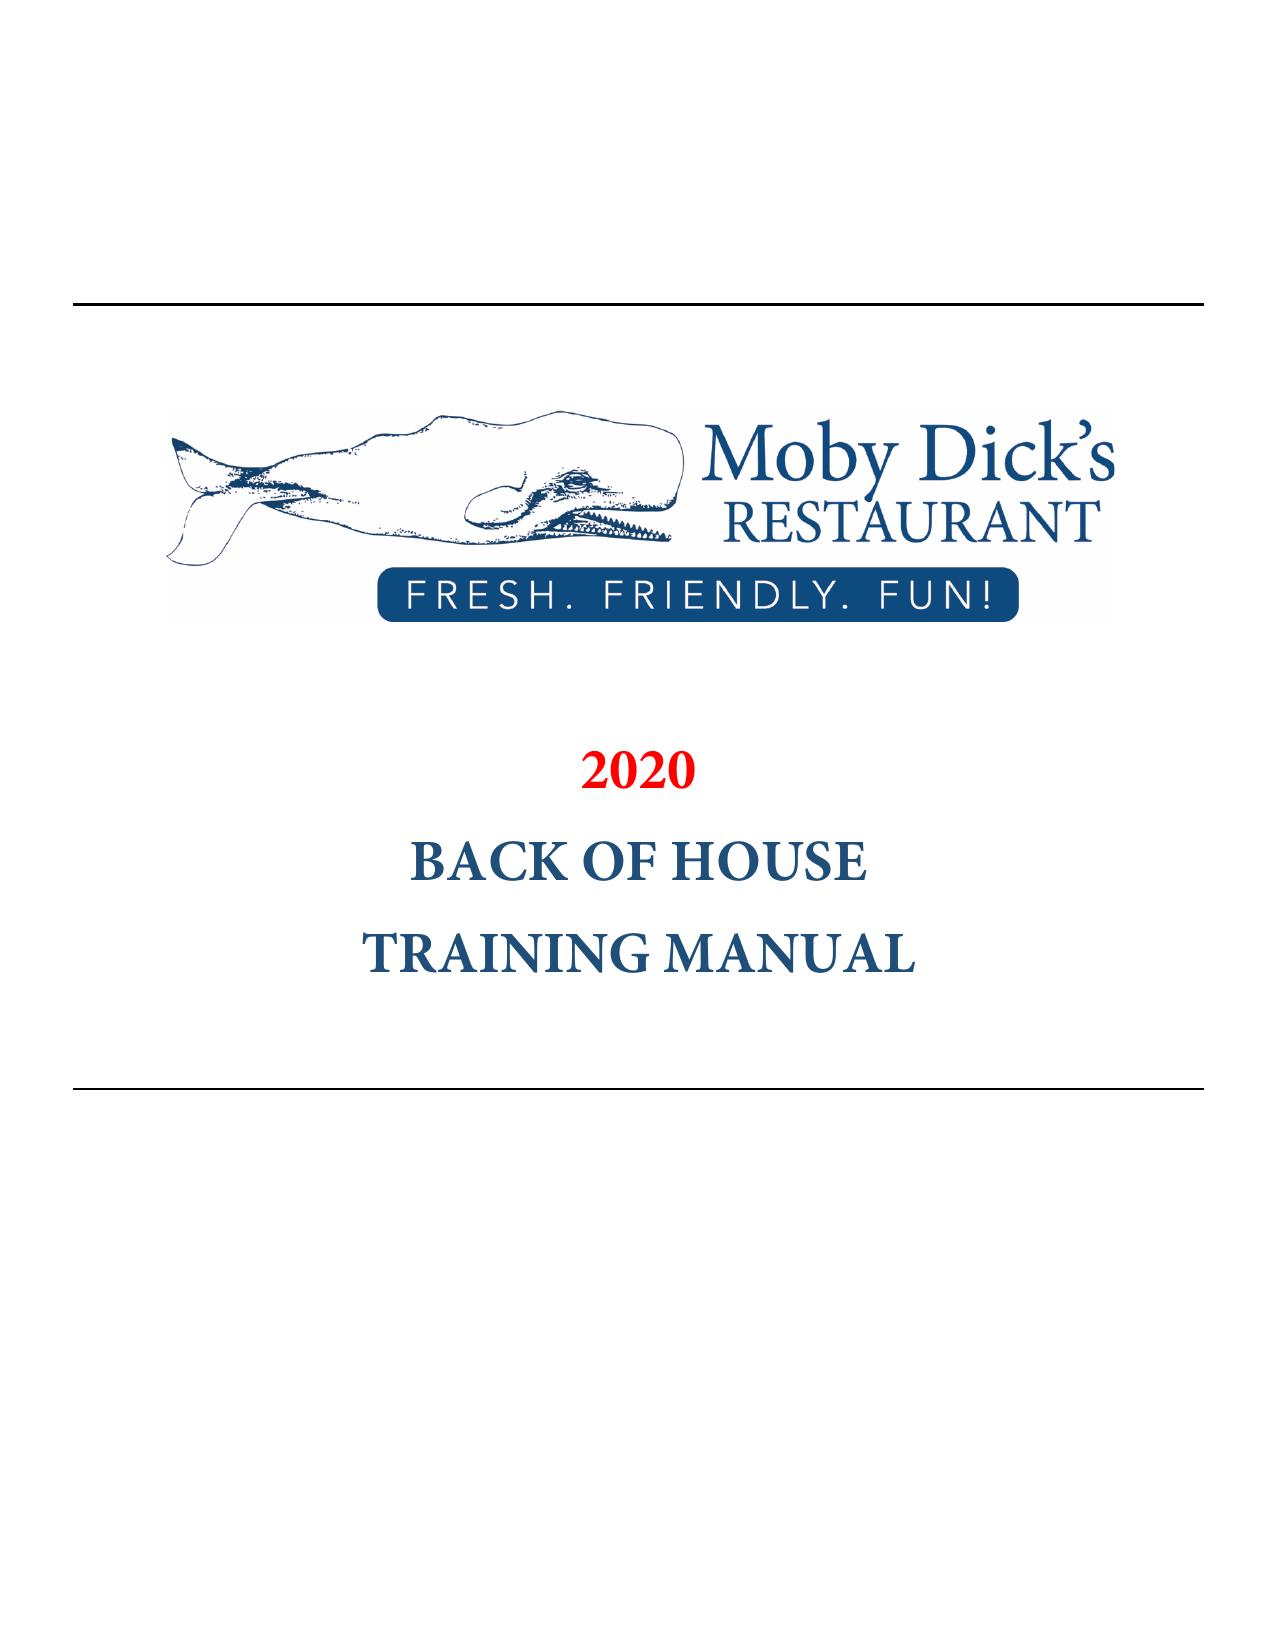 Mobys Boh Training Doc 2019